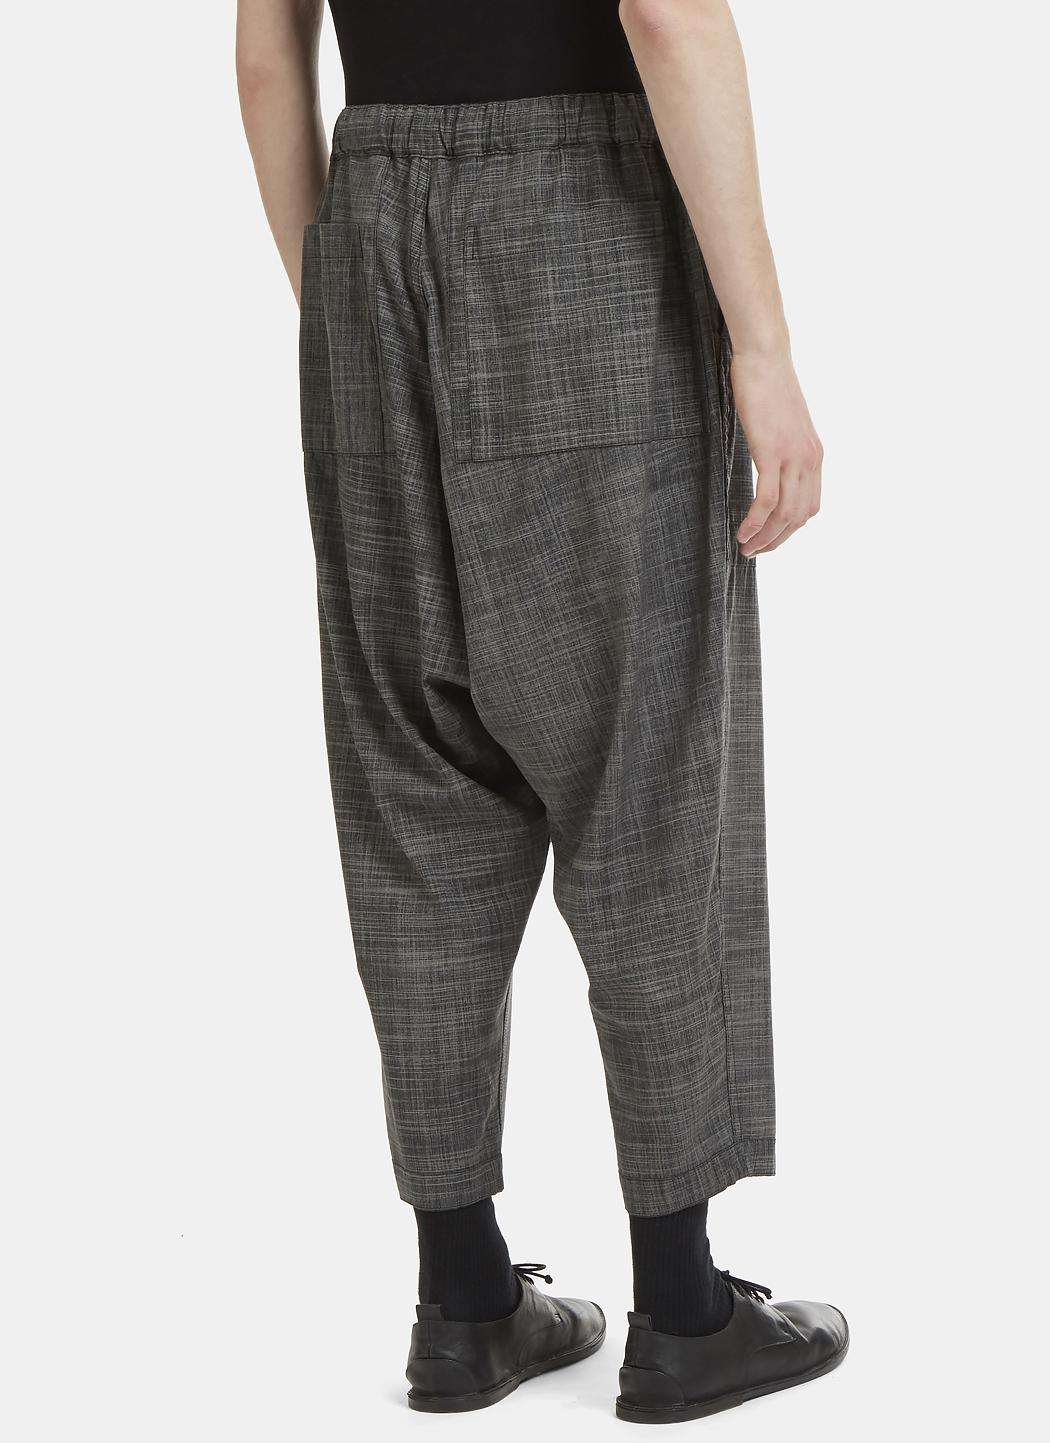 Issey Miyake Wool Reversible Dropped Crotch Slub Pants In Charcoal in Grey for Men